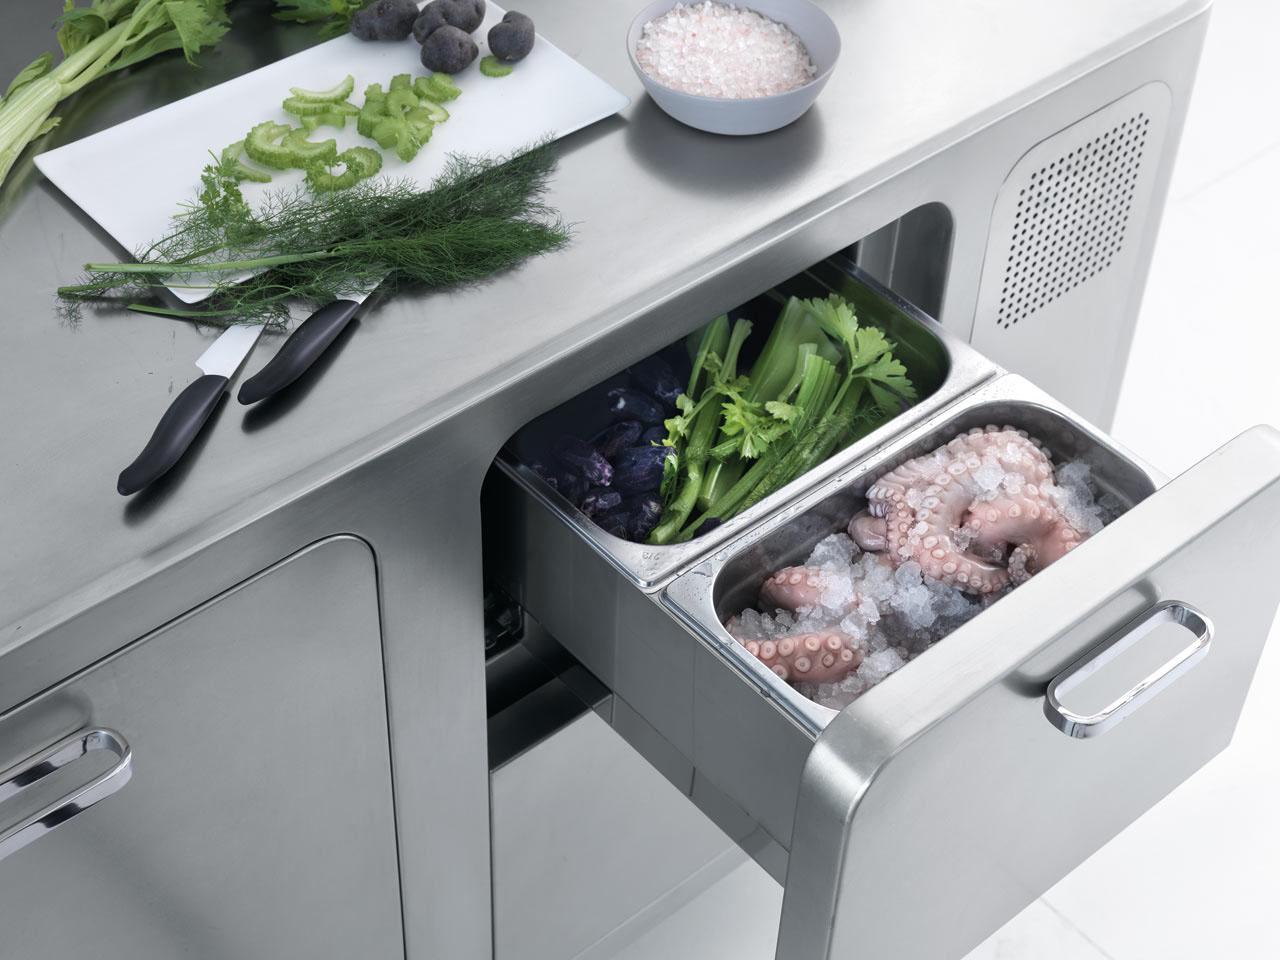 Italian Designed Ergonomic And Hygienic Stainless Steel Kitchen Idesignarch Interior Design